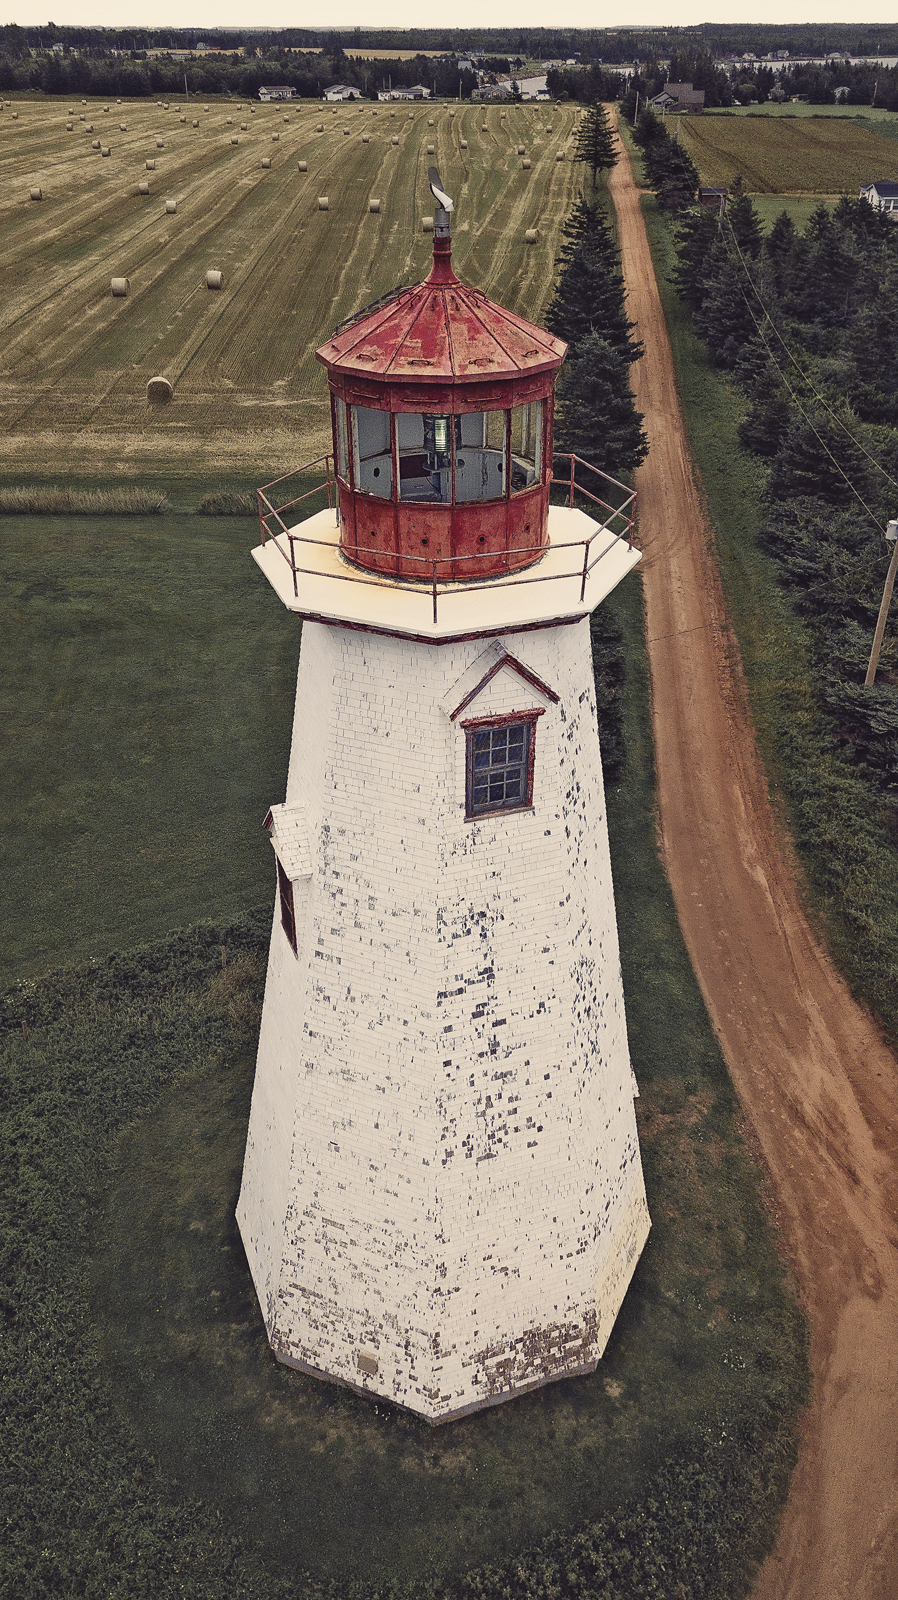 drone uav photo